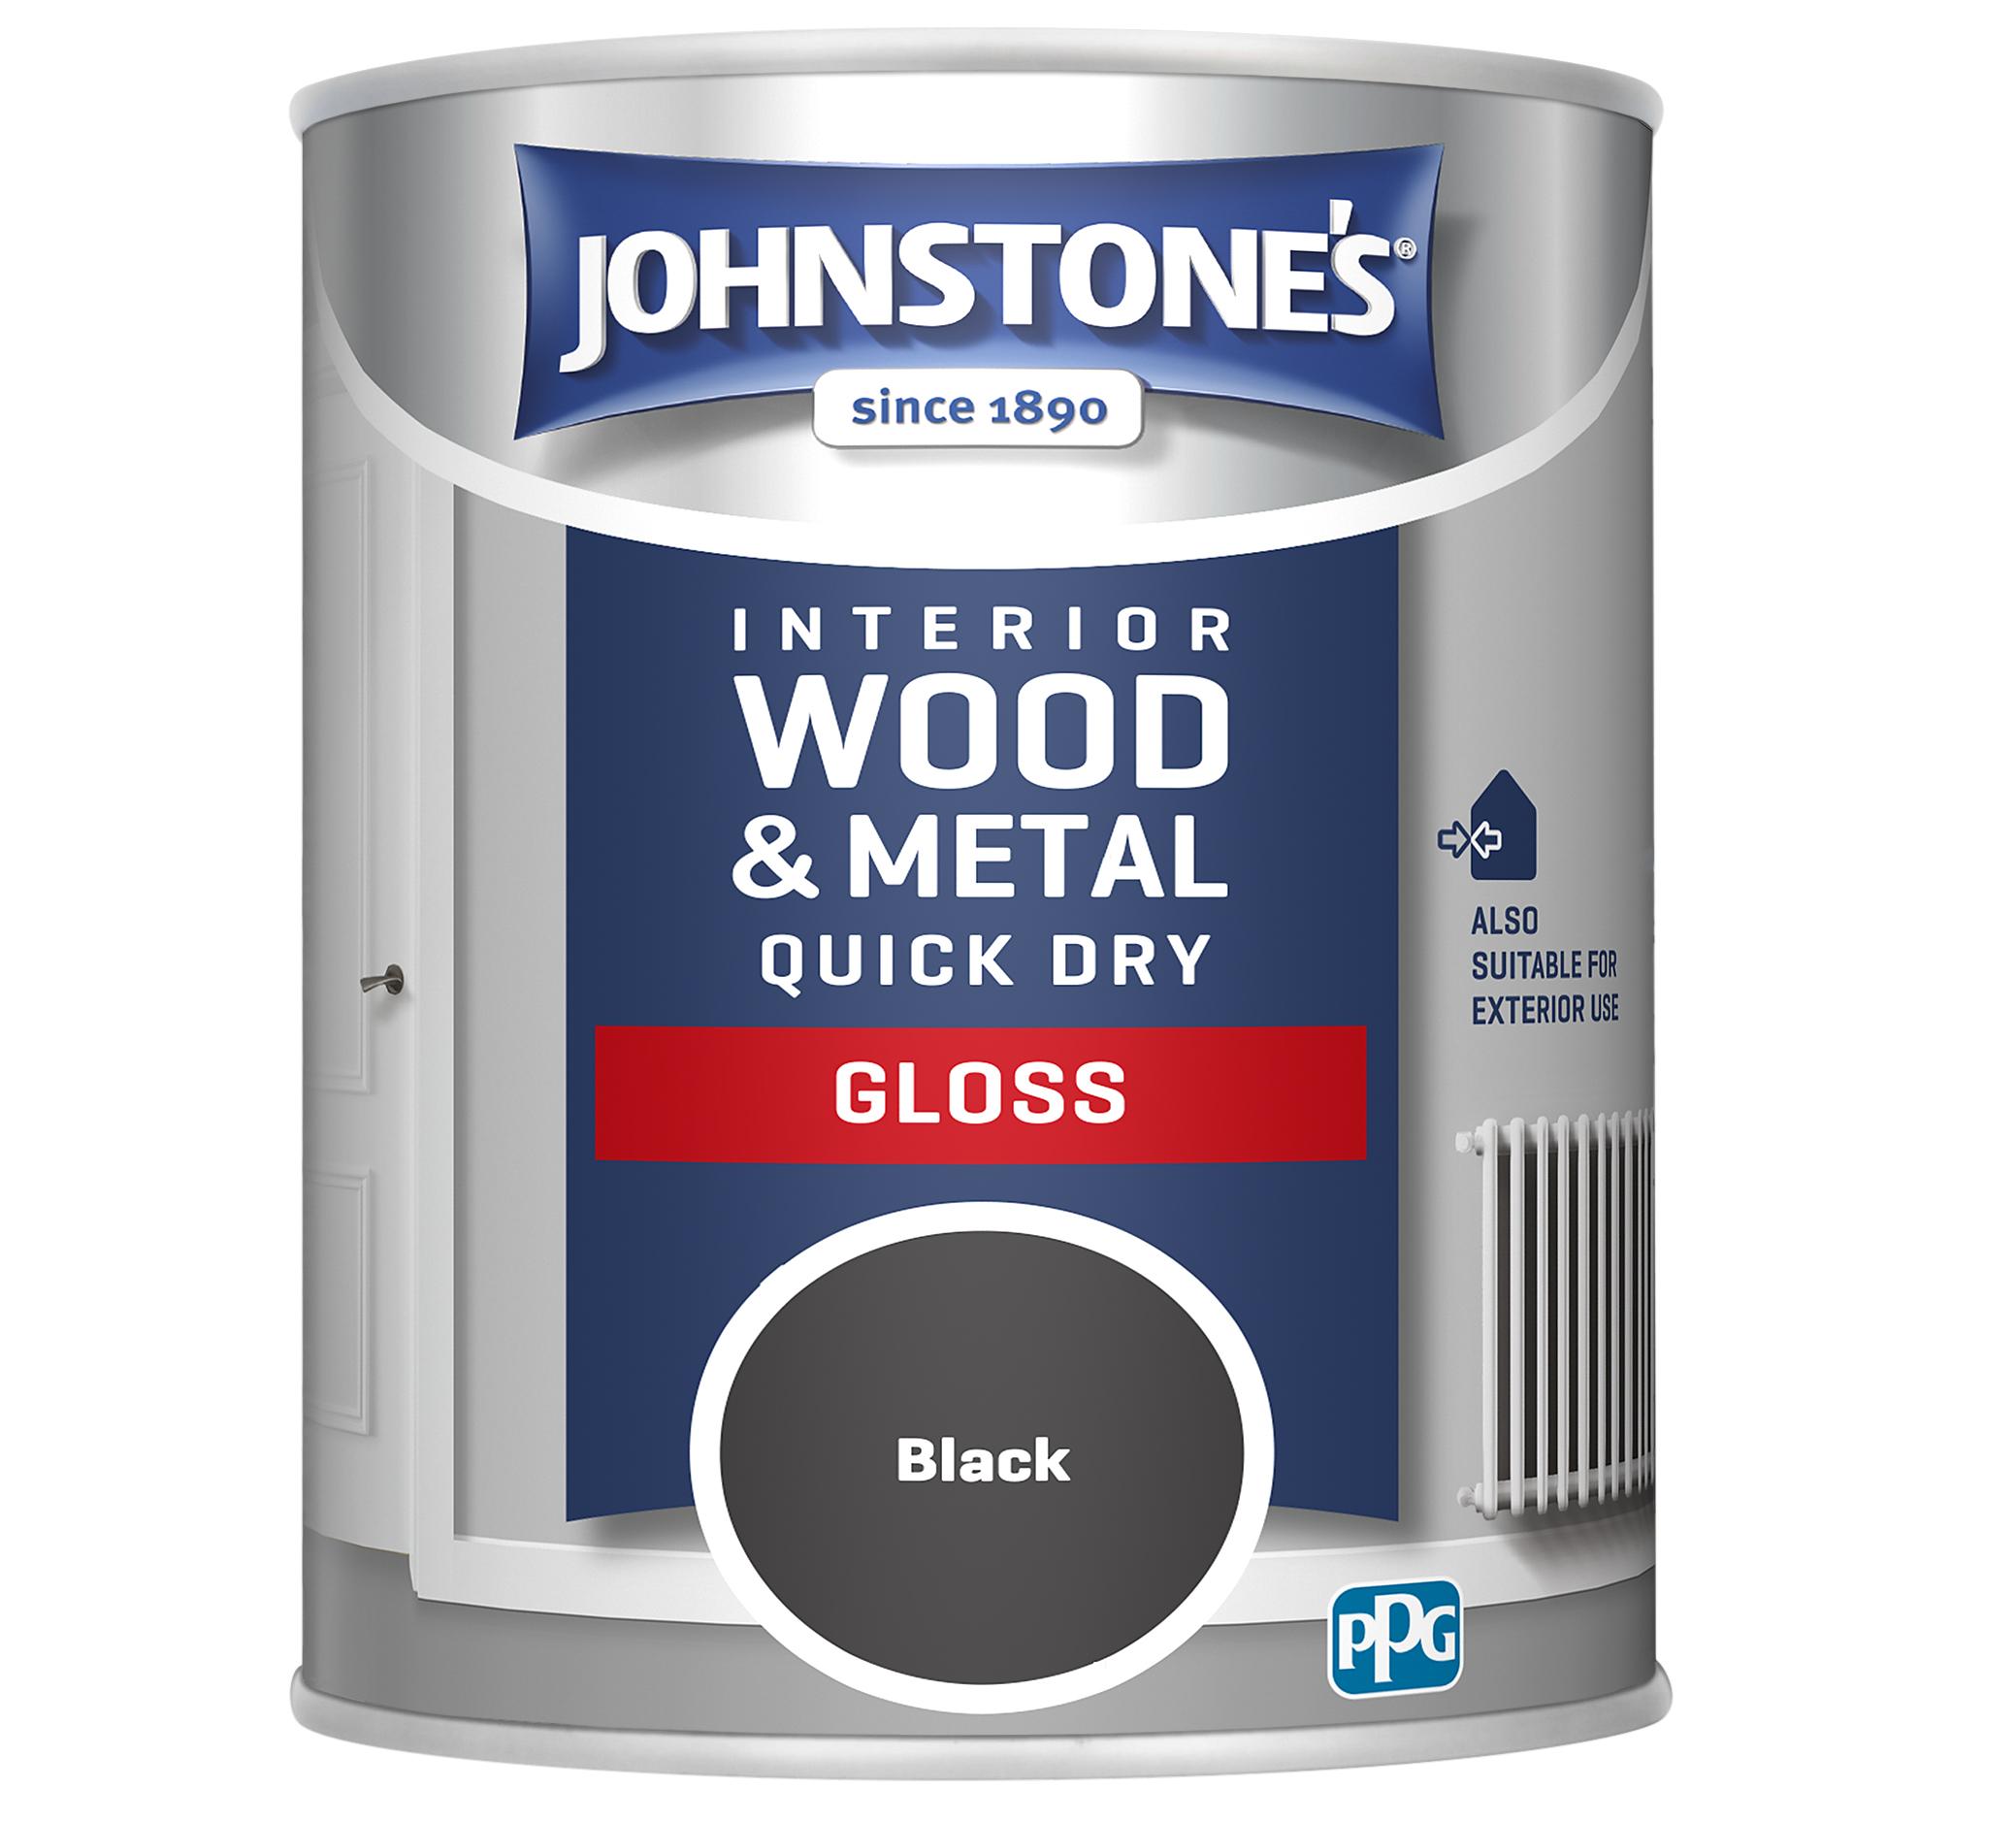 Johnstones 750ml Quick Dry Gloss Paint - Black